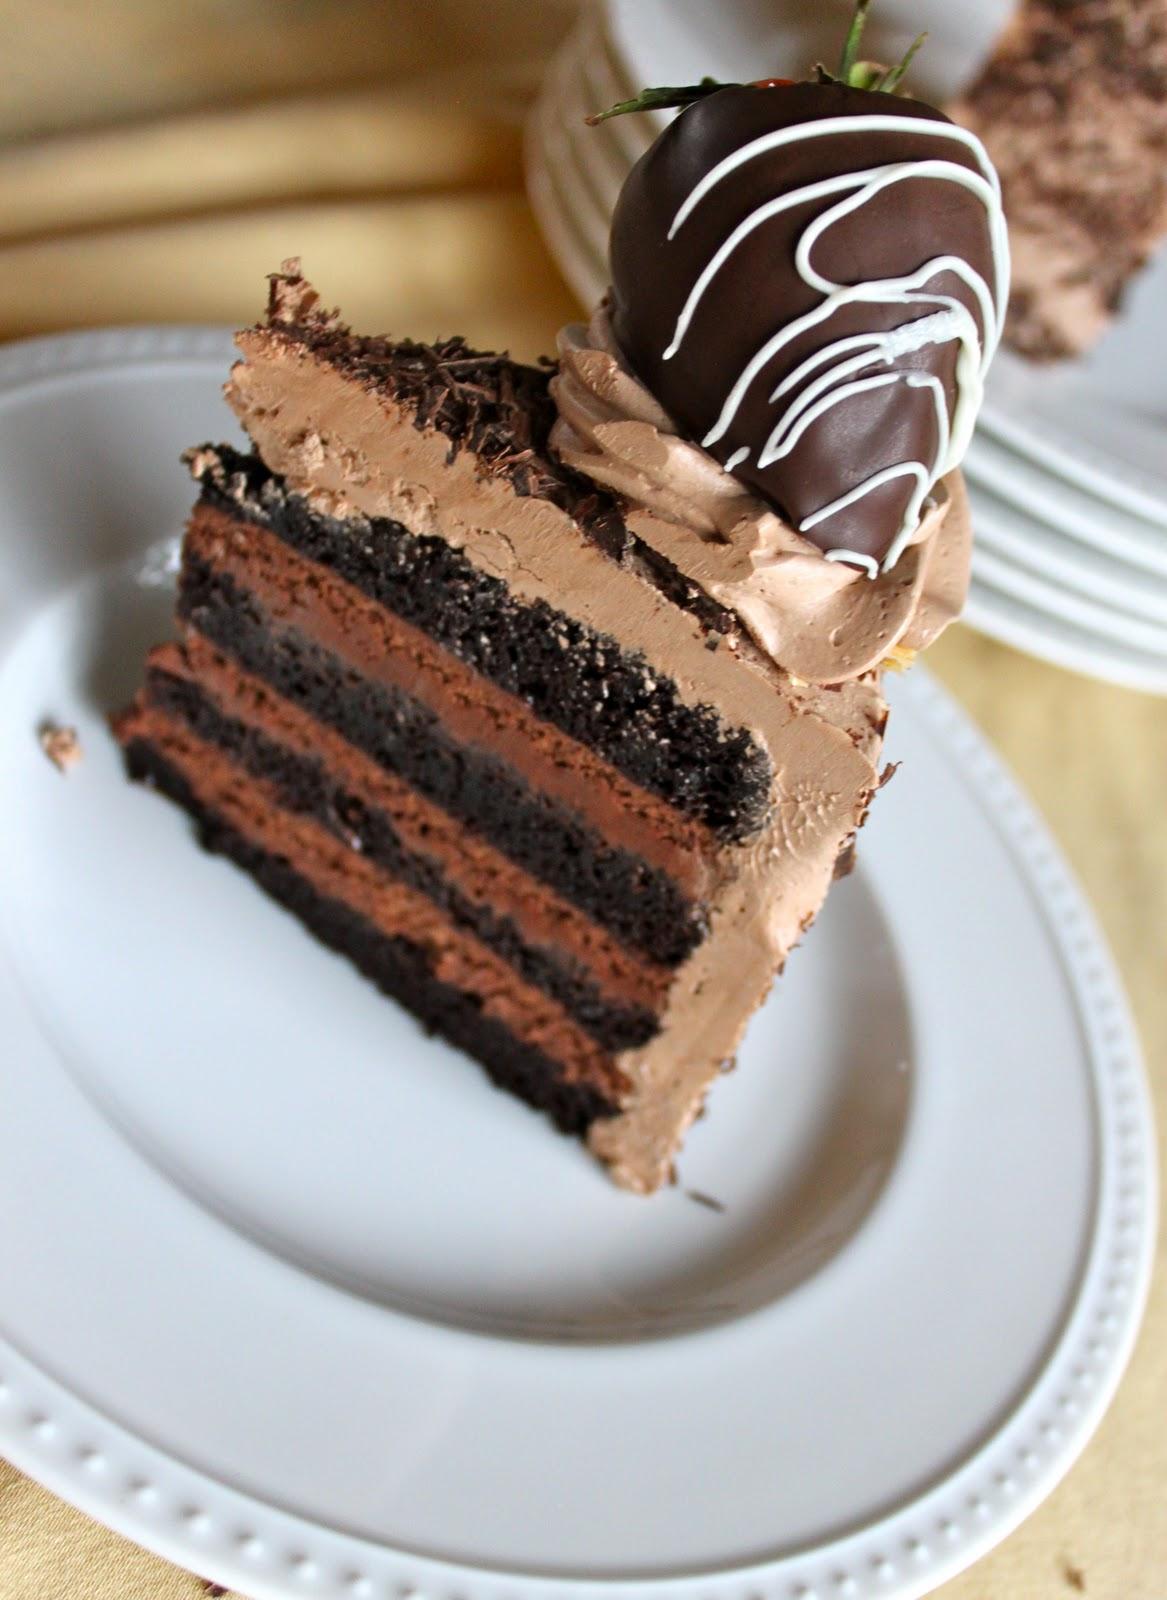 Chocolate Mousse Cake Slice I used my go to chocolate cake